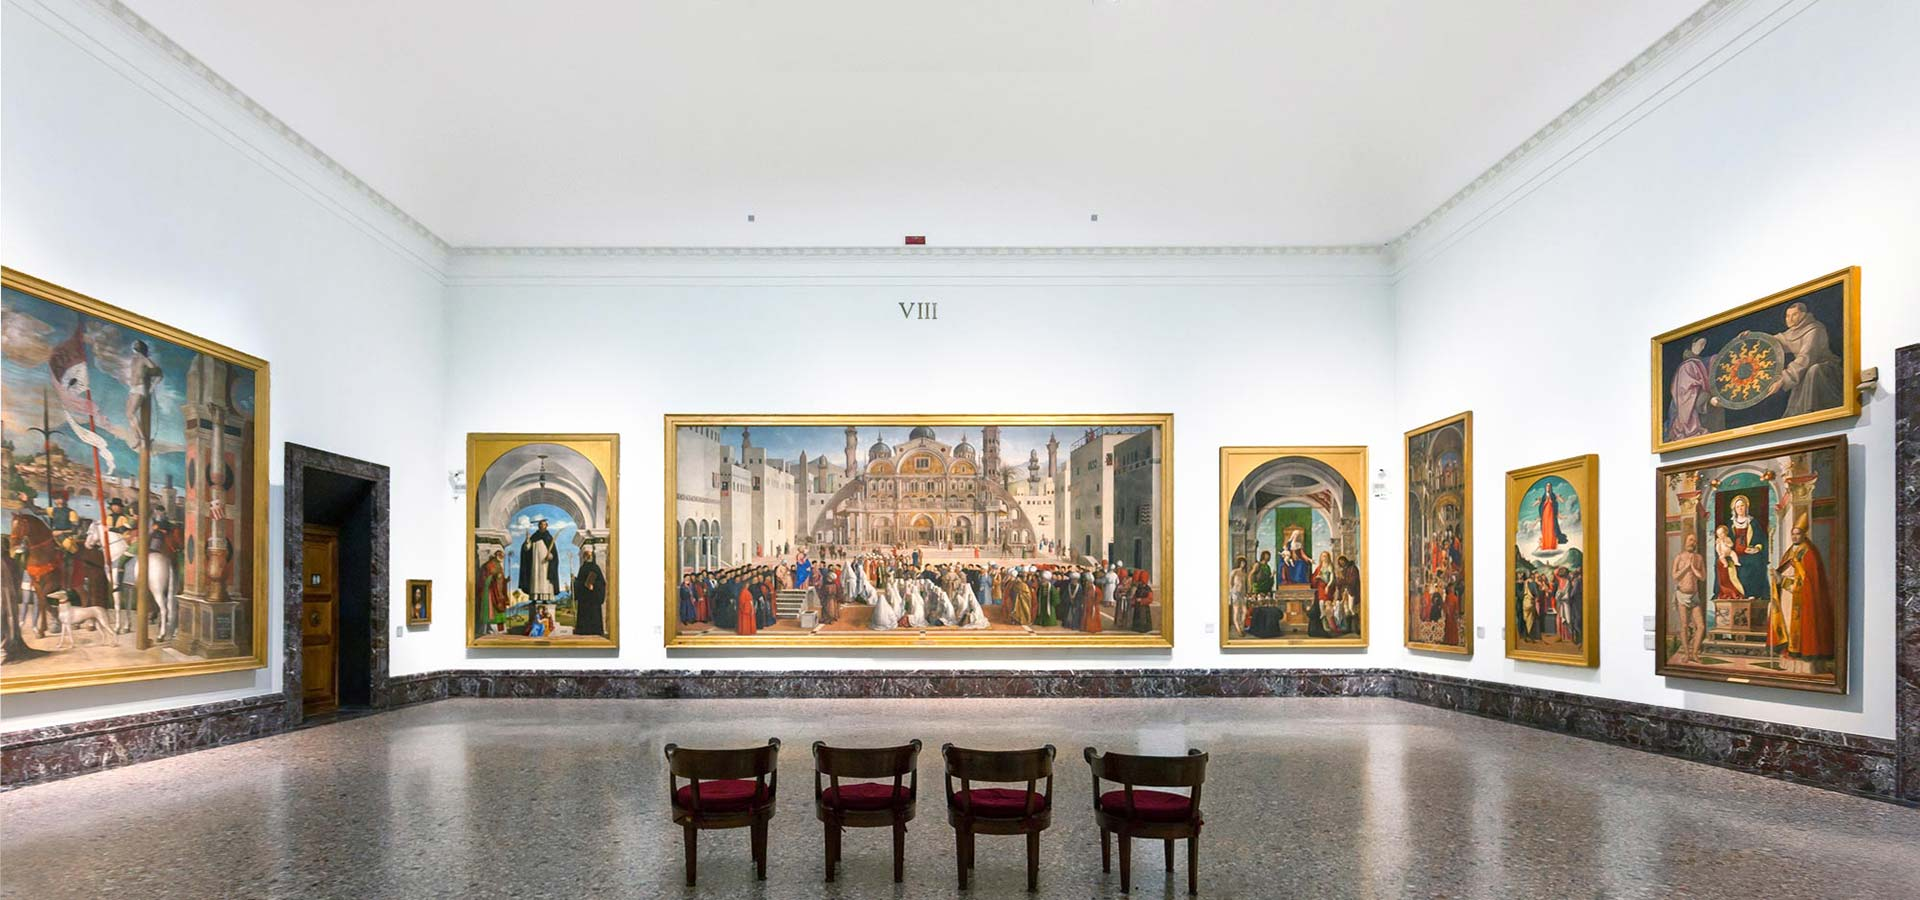 Галерея Пинакотека Брера в Милане